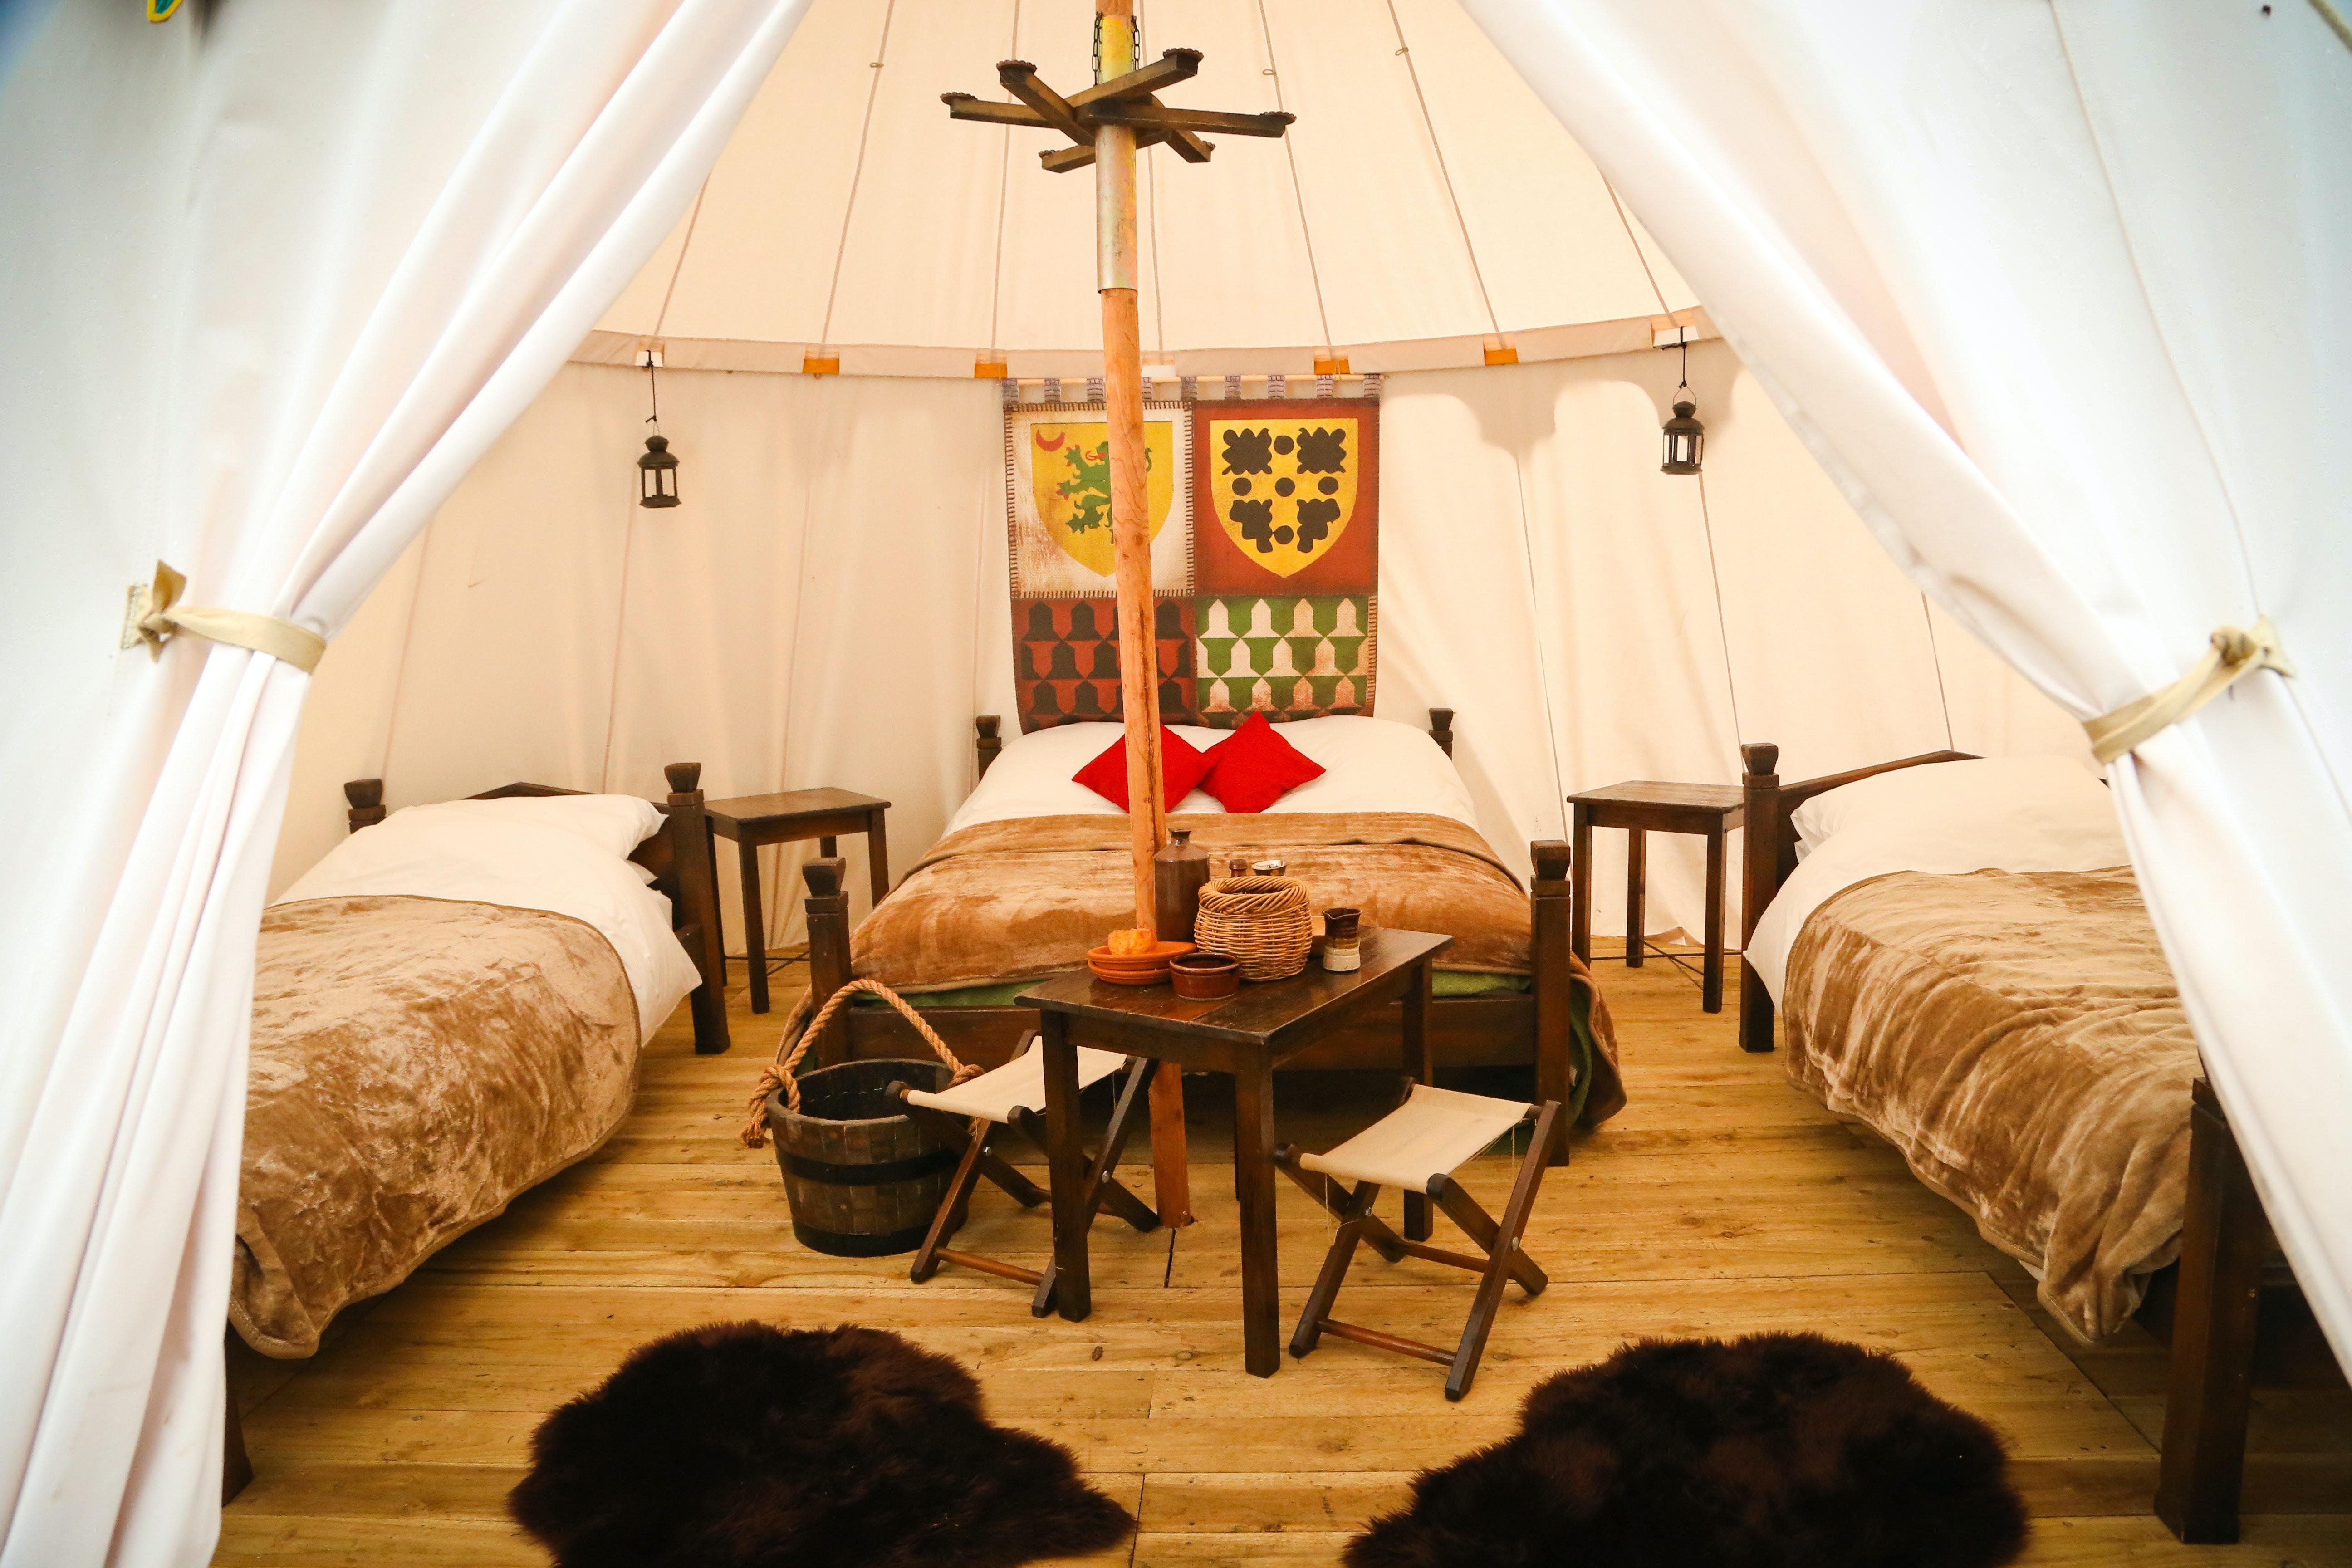 Castle tent interior